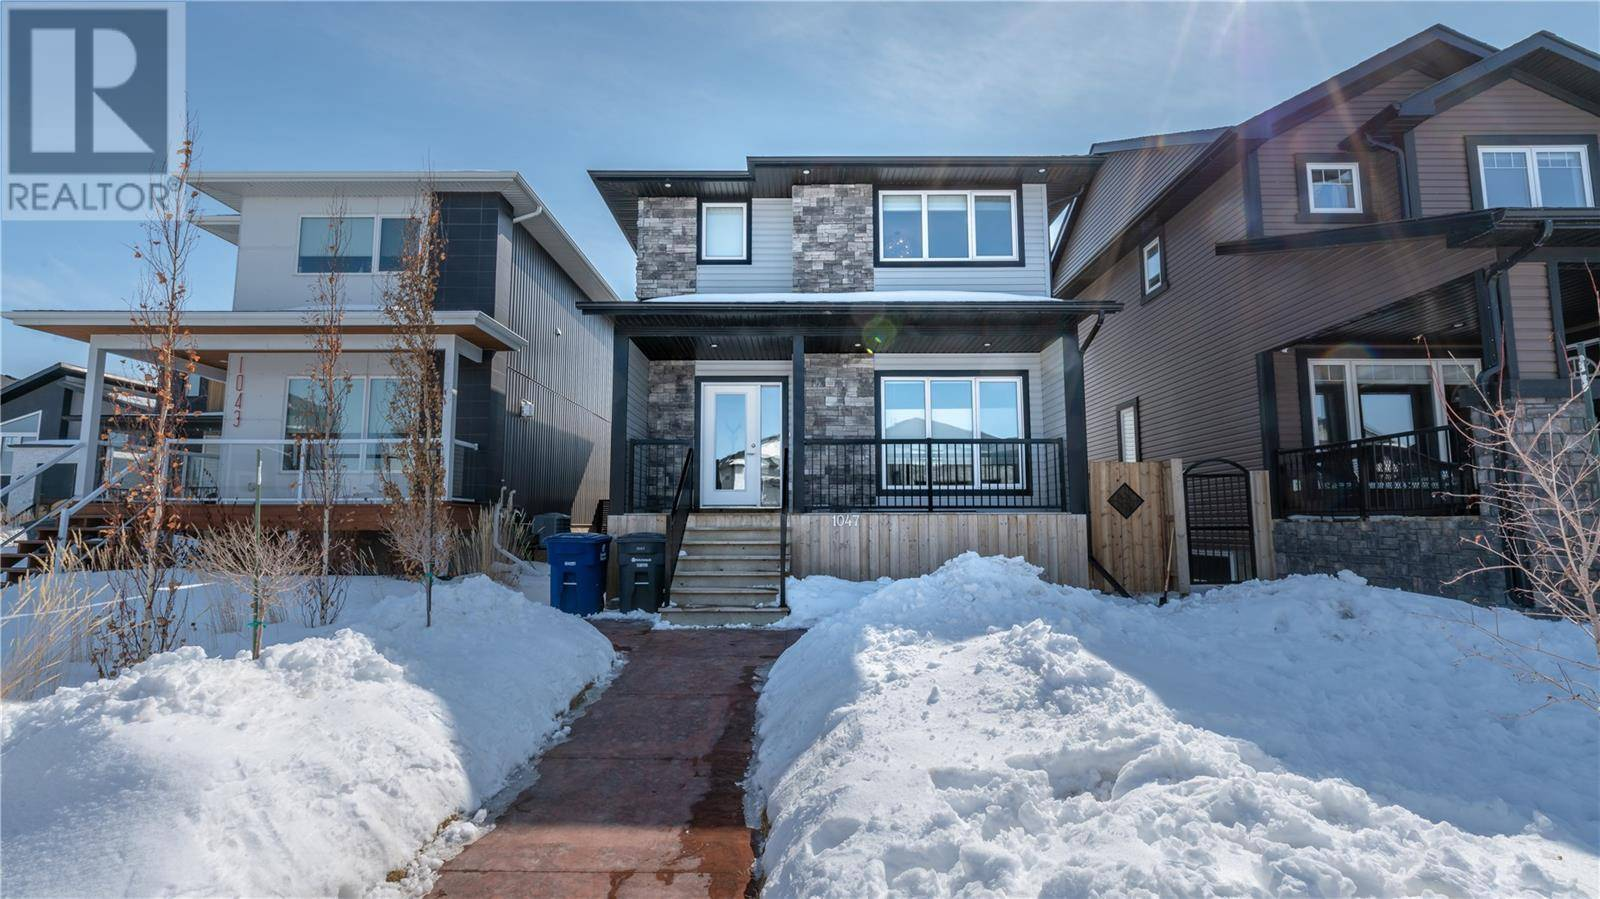 House for sale at 1047 Kloppenburg Bnd  Saskatoon Saskatchewan - MLS: SK804527